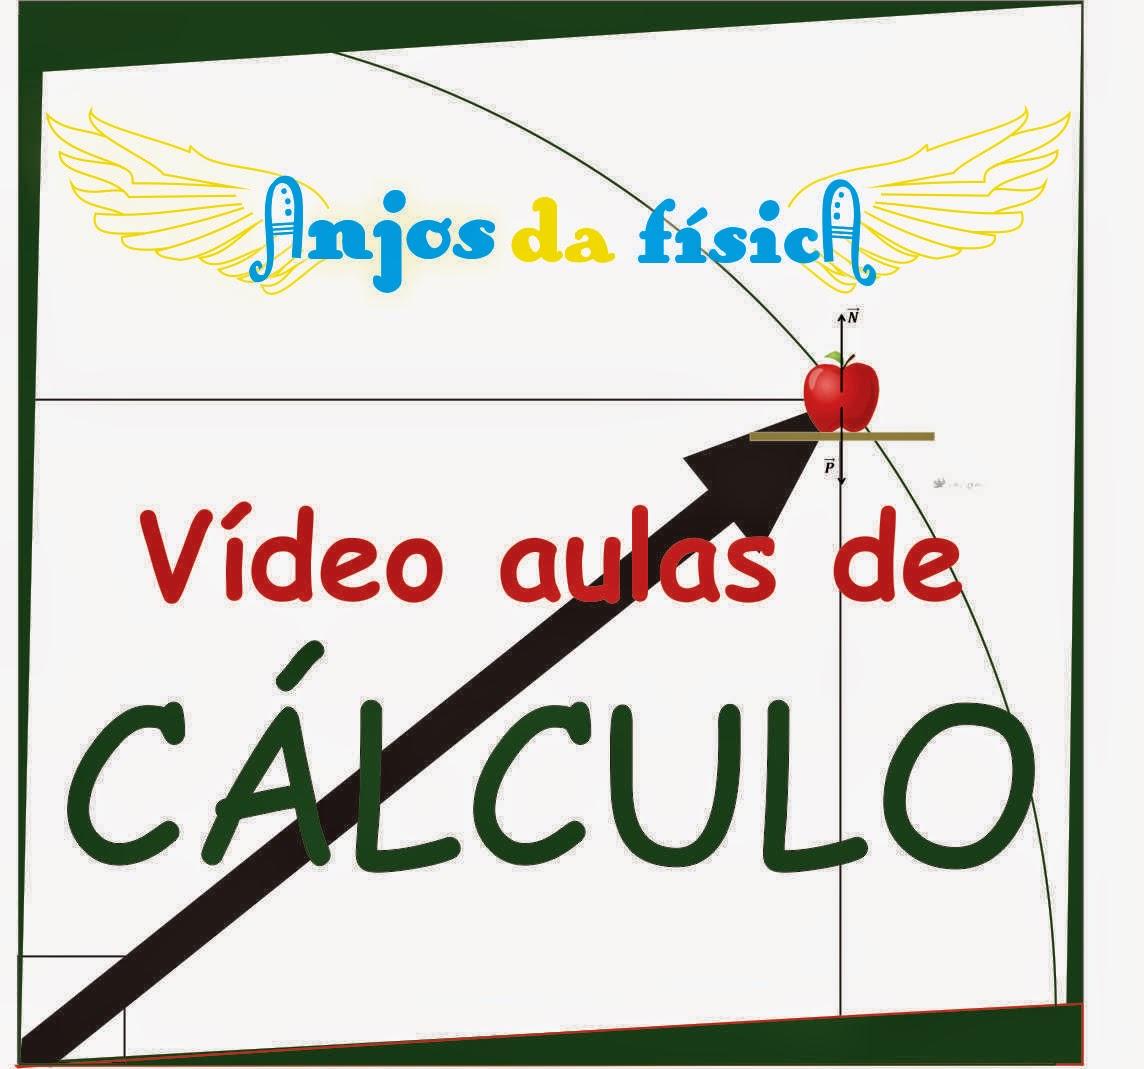 http://anjosdafisica-calculo.blogspot.com.br/